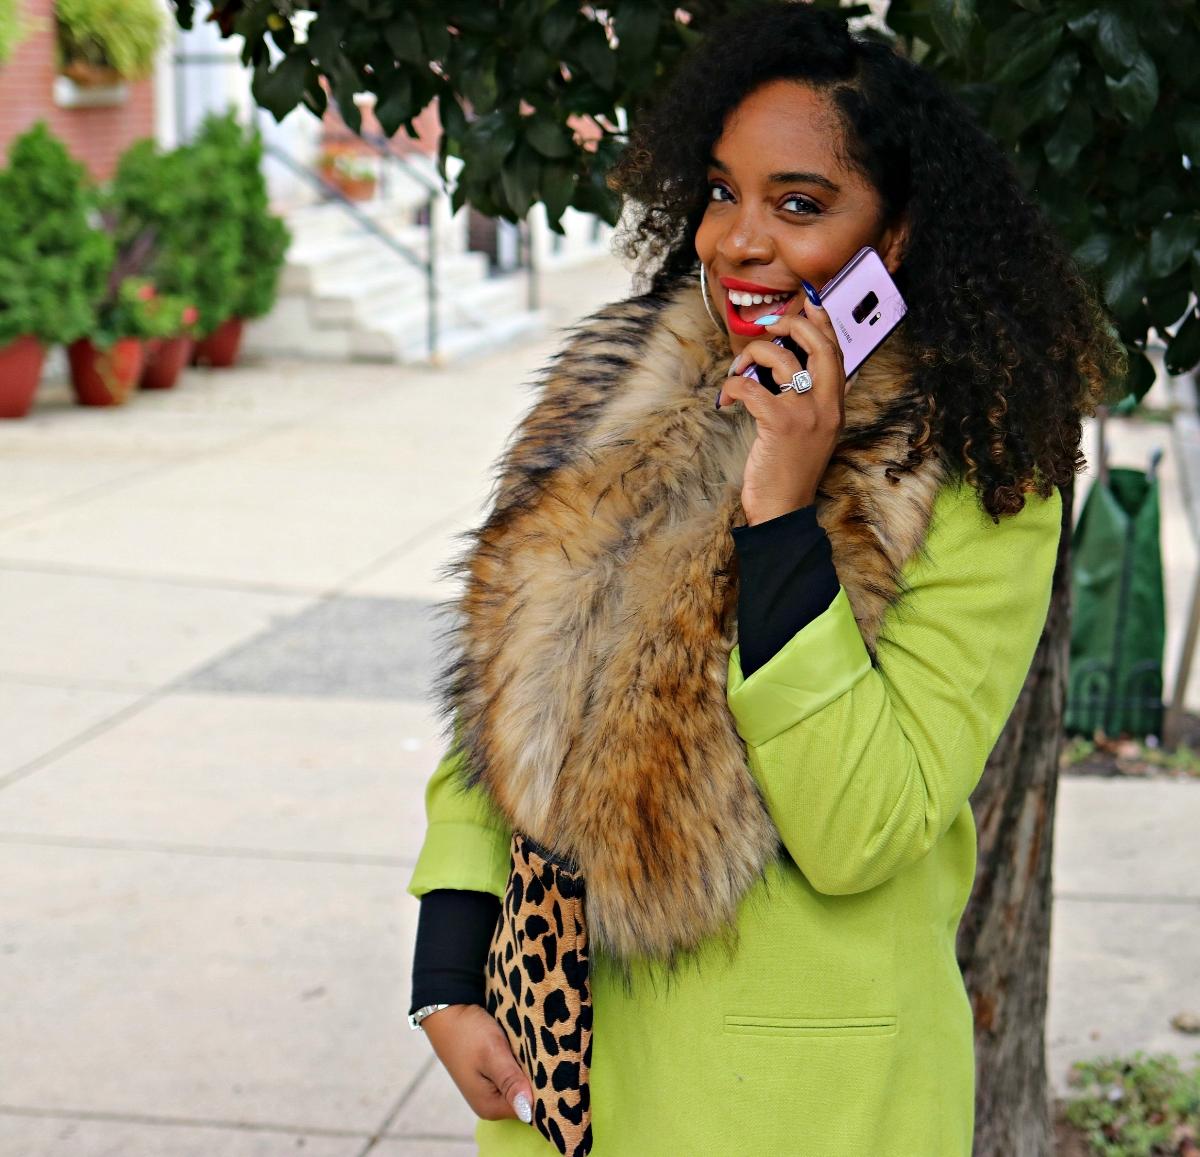 Cricket Wireless, SAmsung Galaxy S9, Green Blazer, Faux Fur Scarf